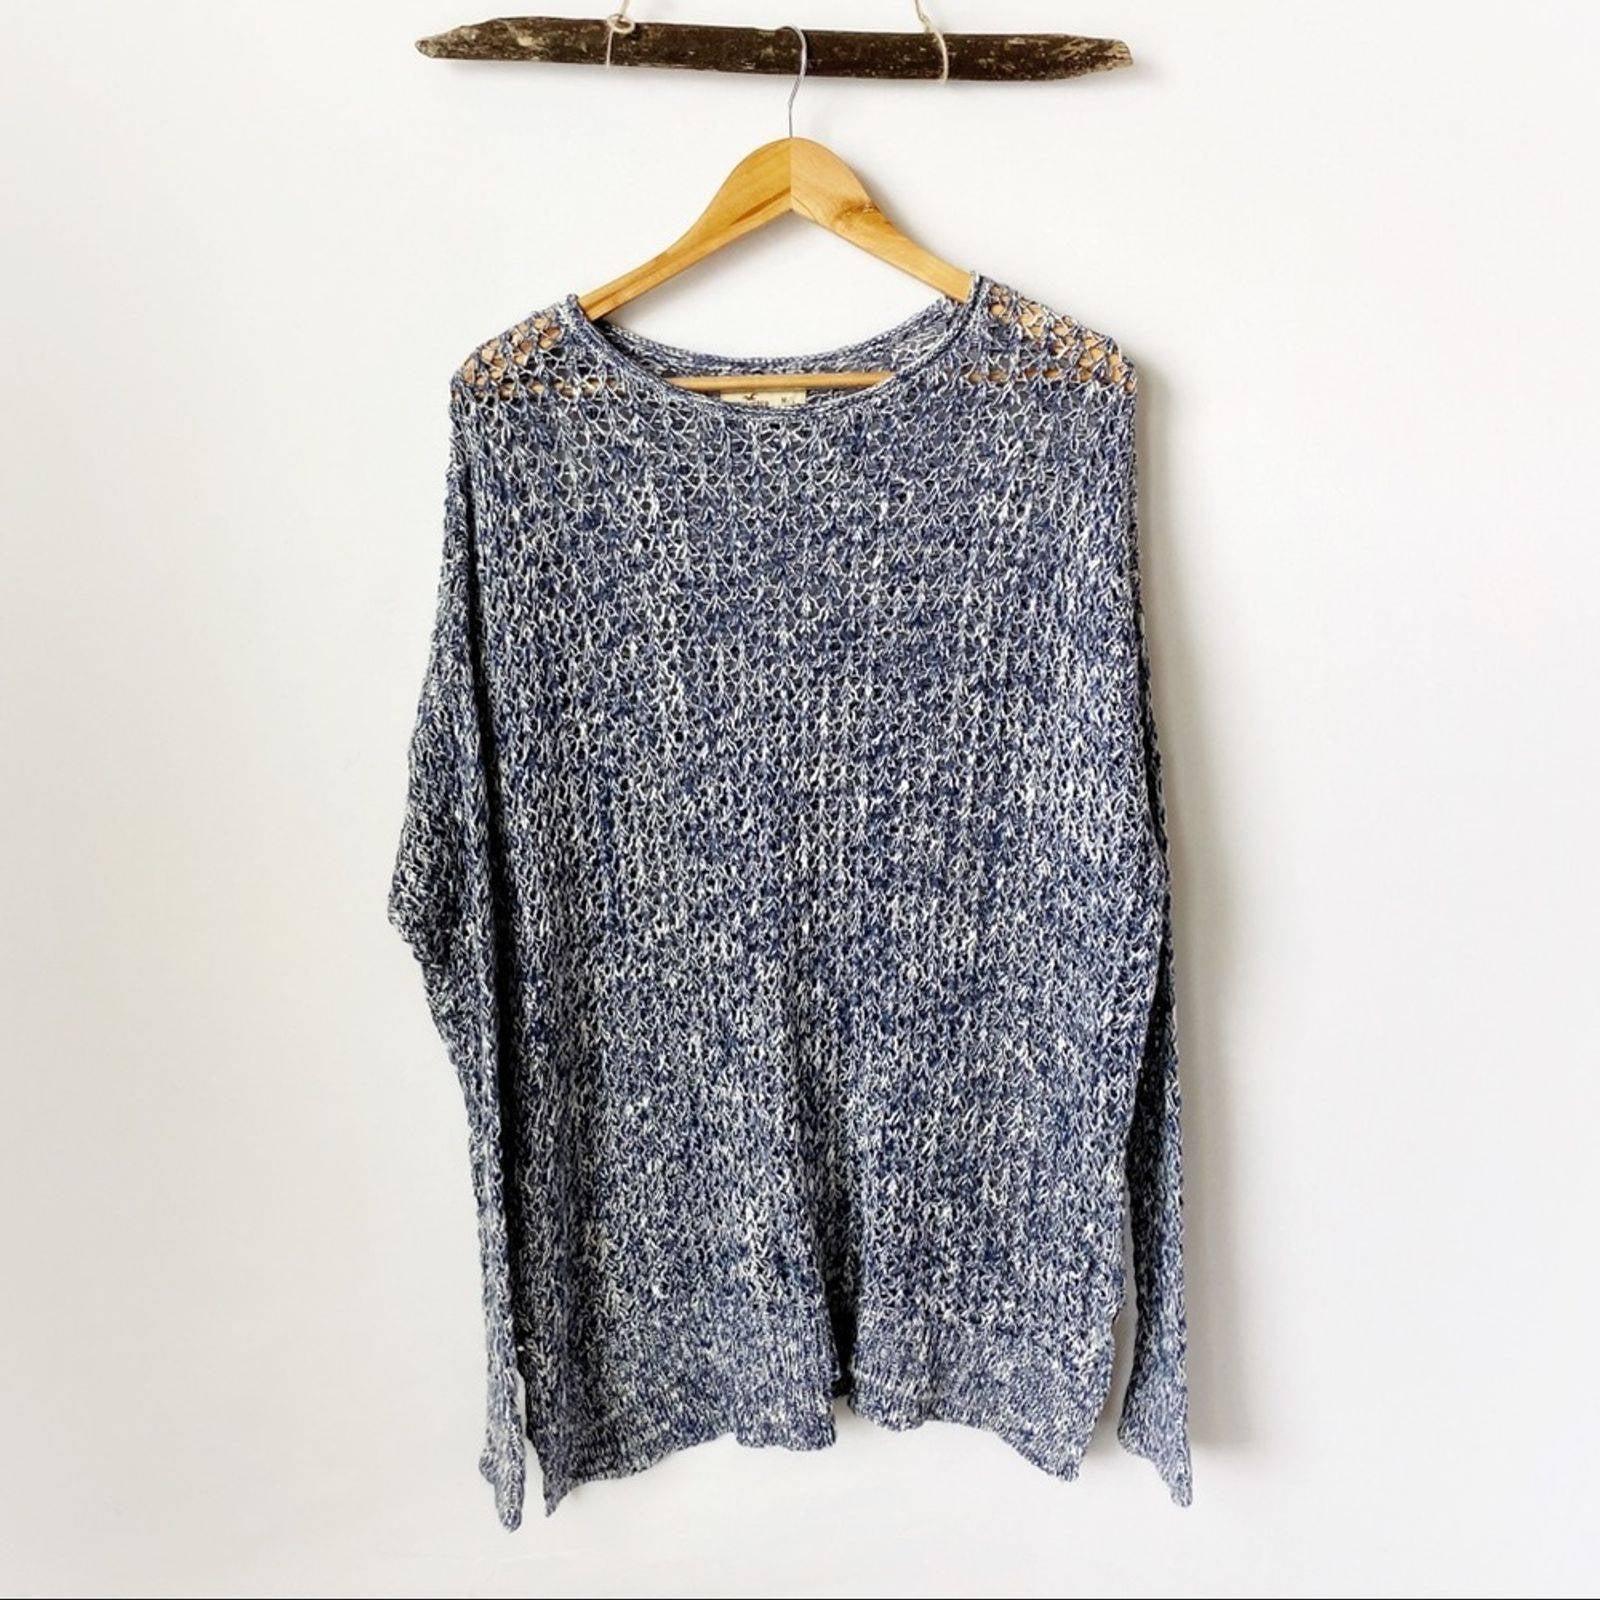 Hollister Blue White Knit Sweater M / L